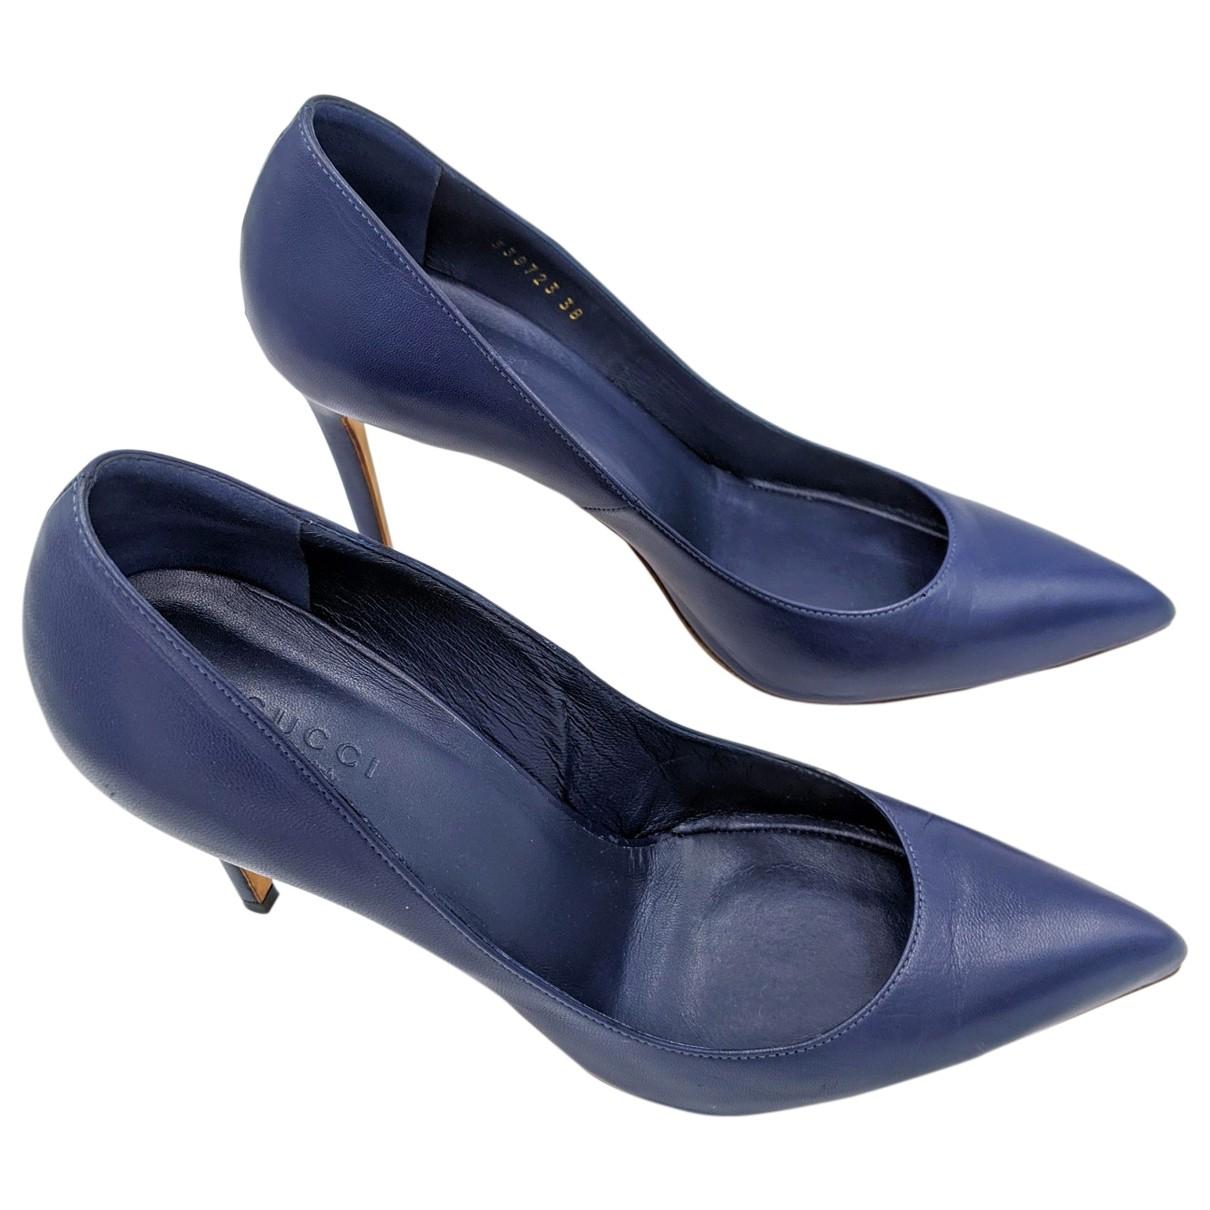 Gucci \N Pumps in  Blau Leder